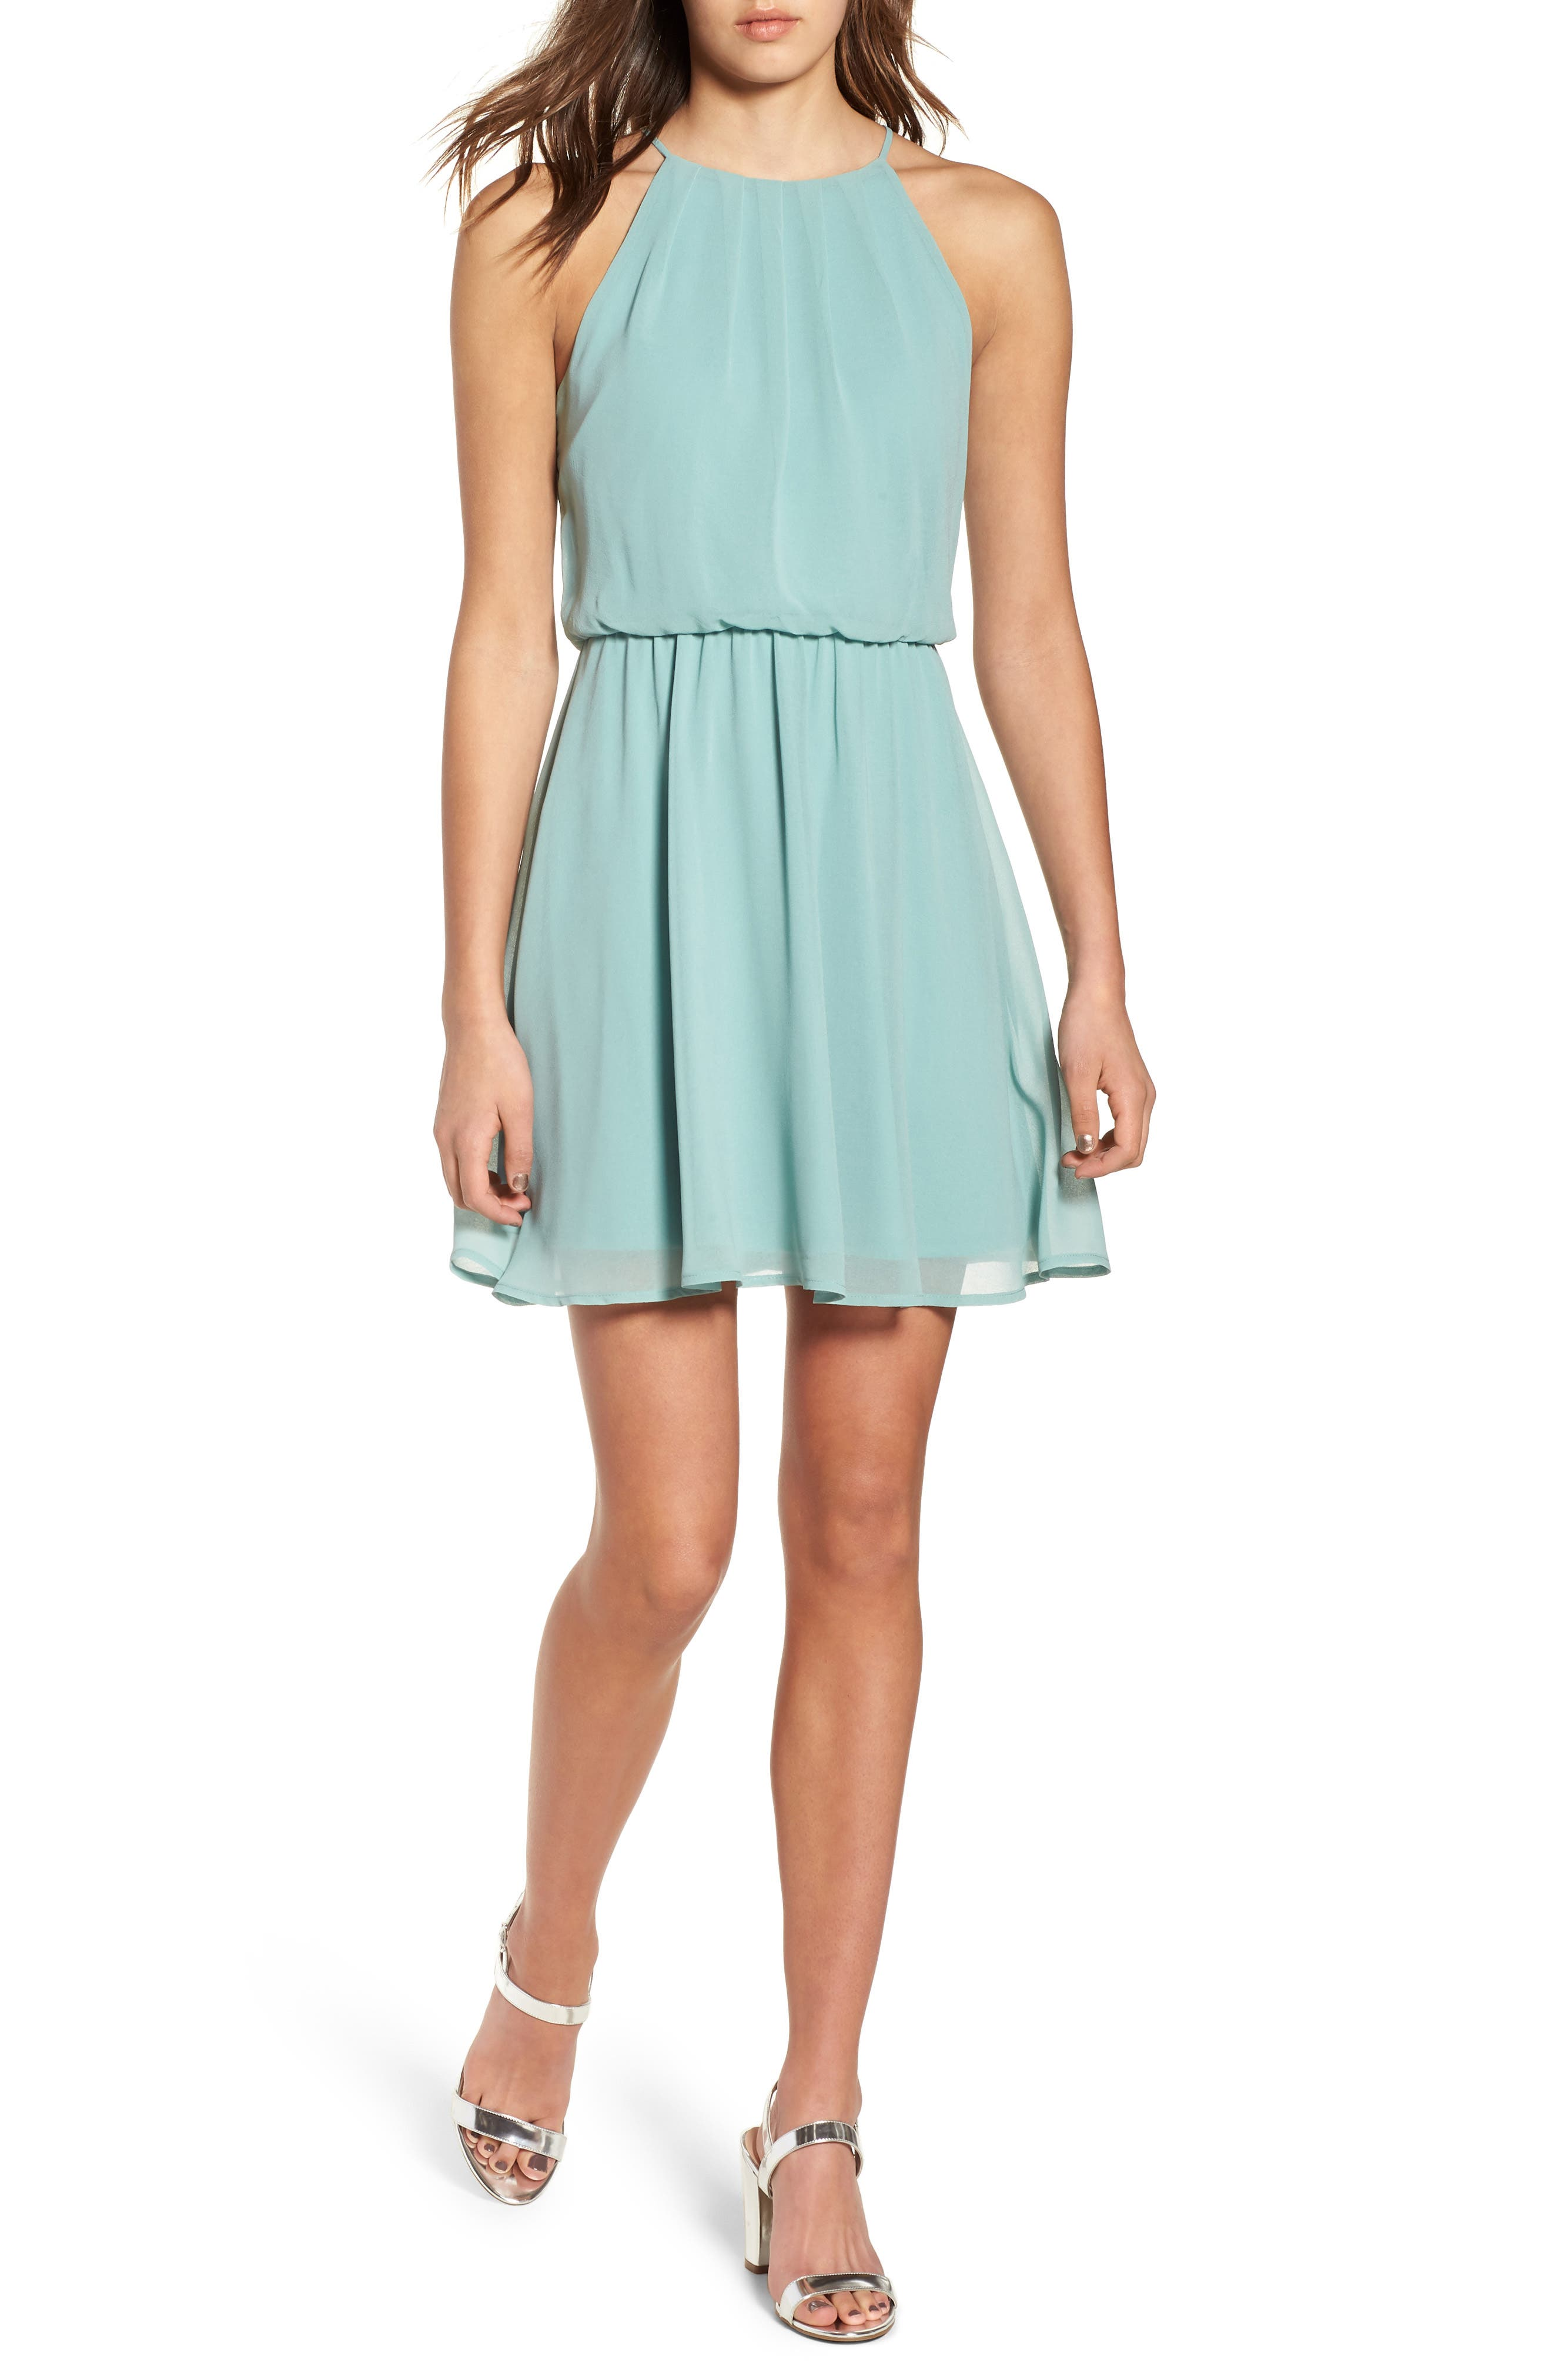 Juniors\' Dresses Clothing | Nordstrom